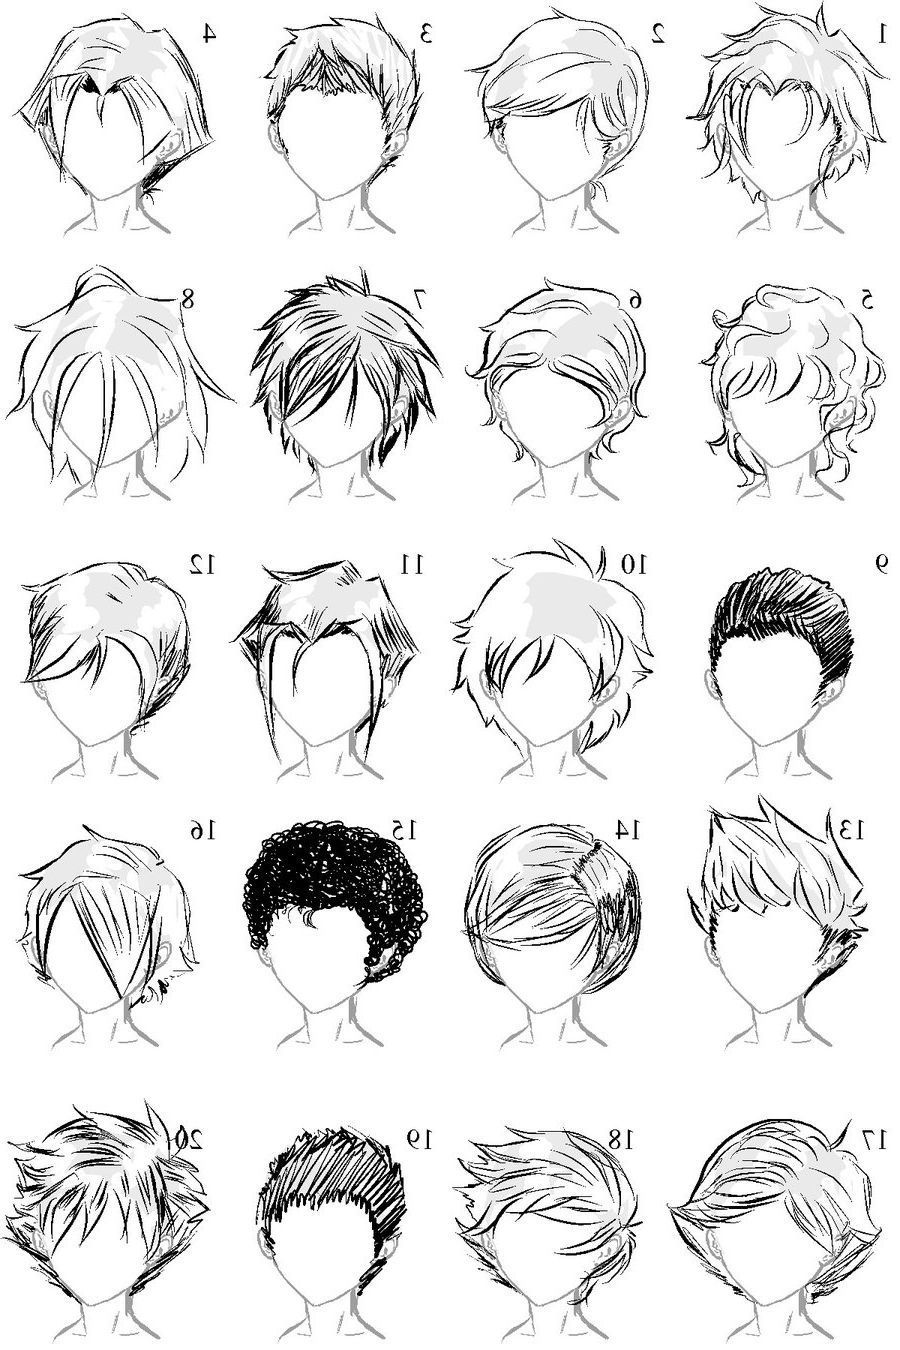 20 Anime Male Eyes Step By Step In 2020 Manga Hair Anime Boy Hair Boy Hair Drawing